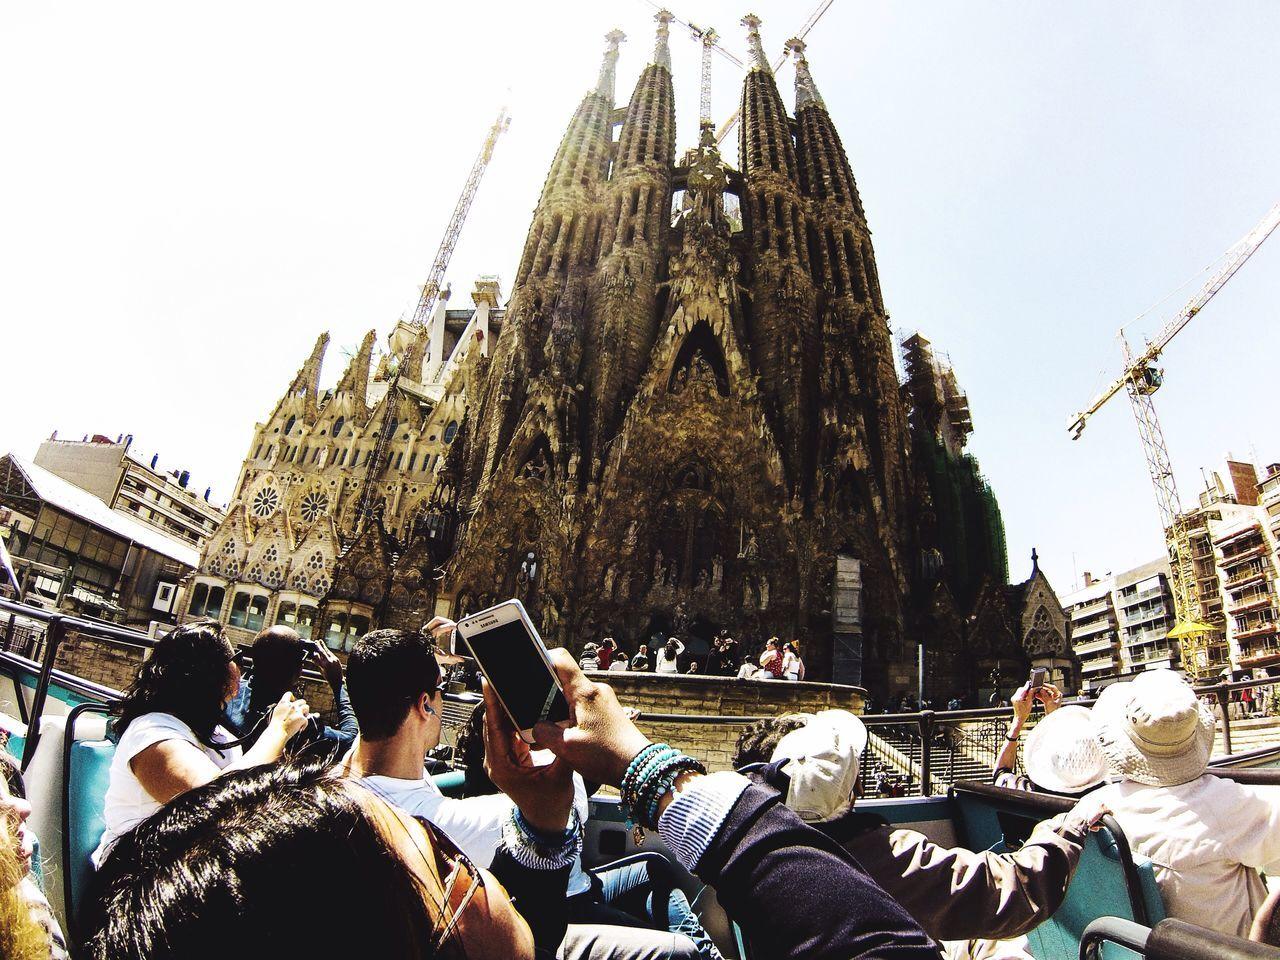 The Tourist Tourbus Tourism Citybus Barcelona♡♥♡♥♡ España Barcelona Barça Sagrada Familia Sagradafamilia Gopro The Great Outdoors - 2017 EyeEm Awards